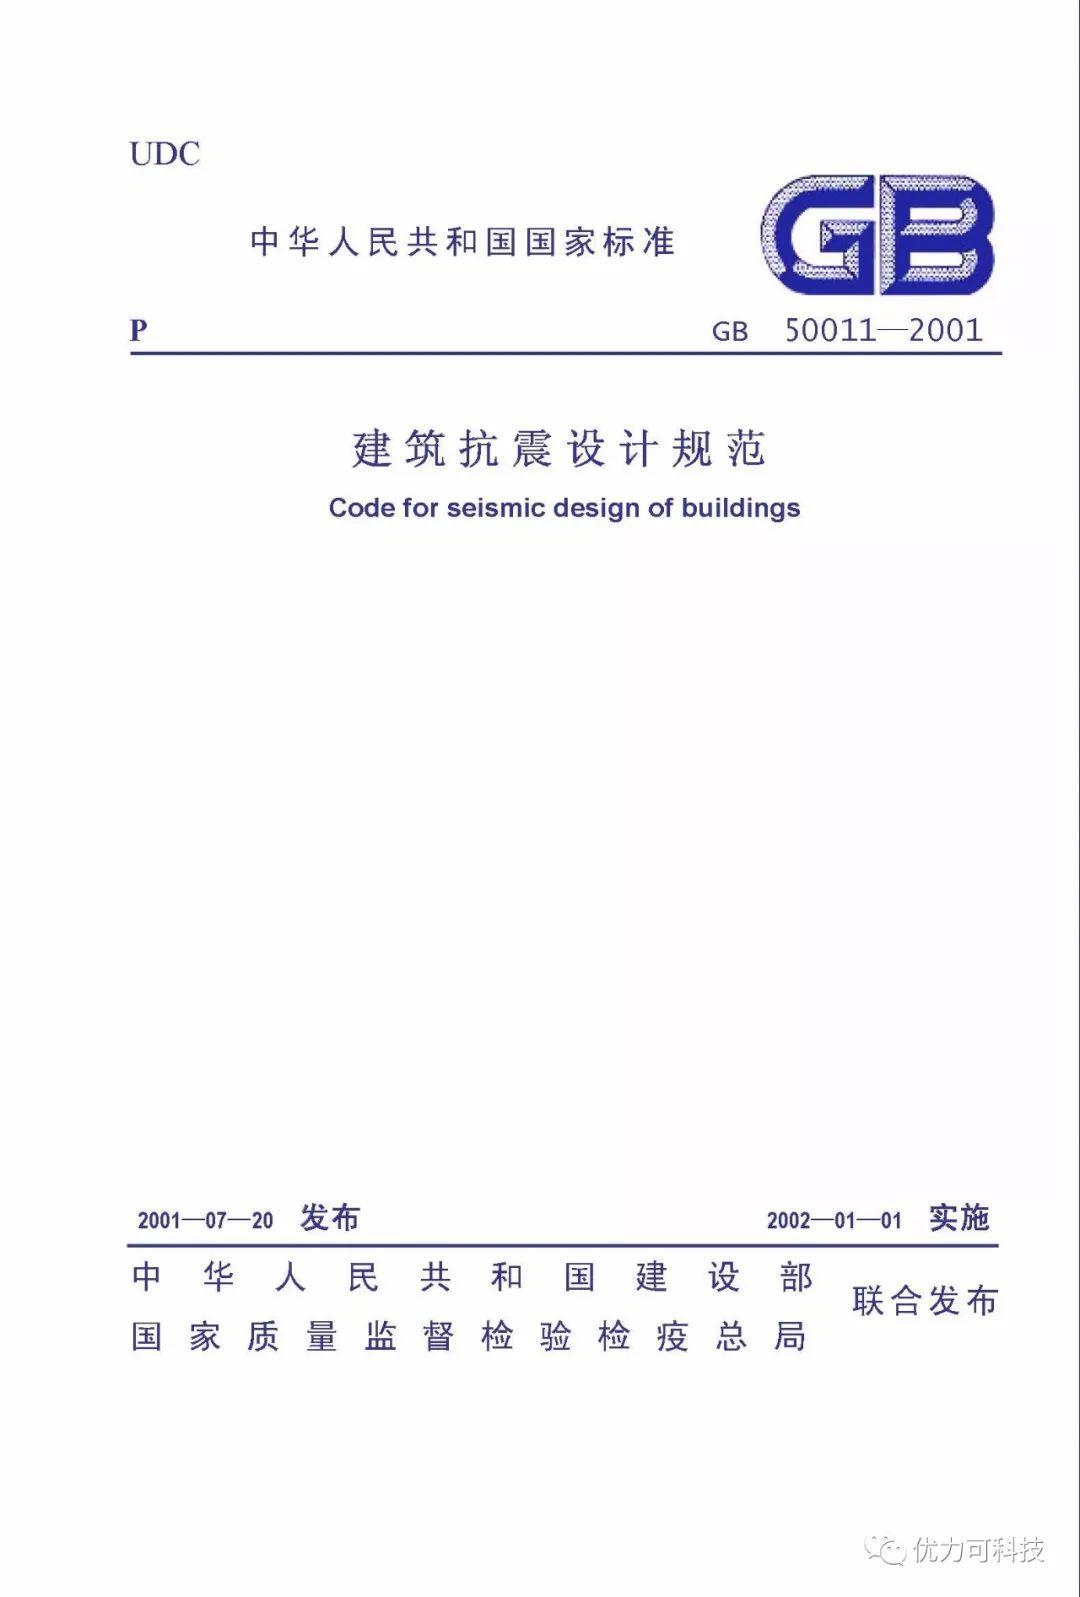 gb50011-2001,建筑抗震设计规范更加完善,首次对非结构构件抗震设计